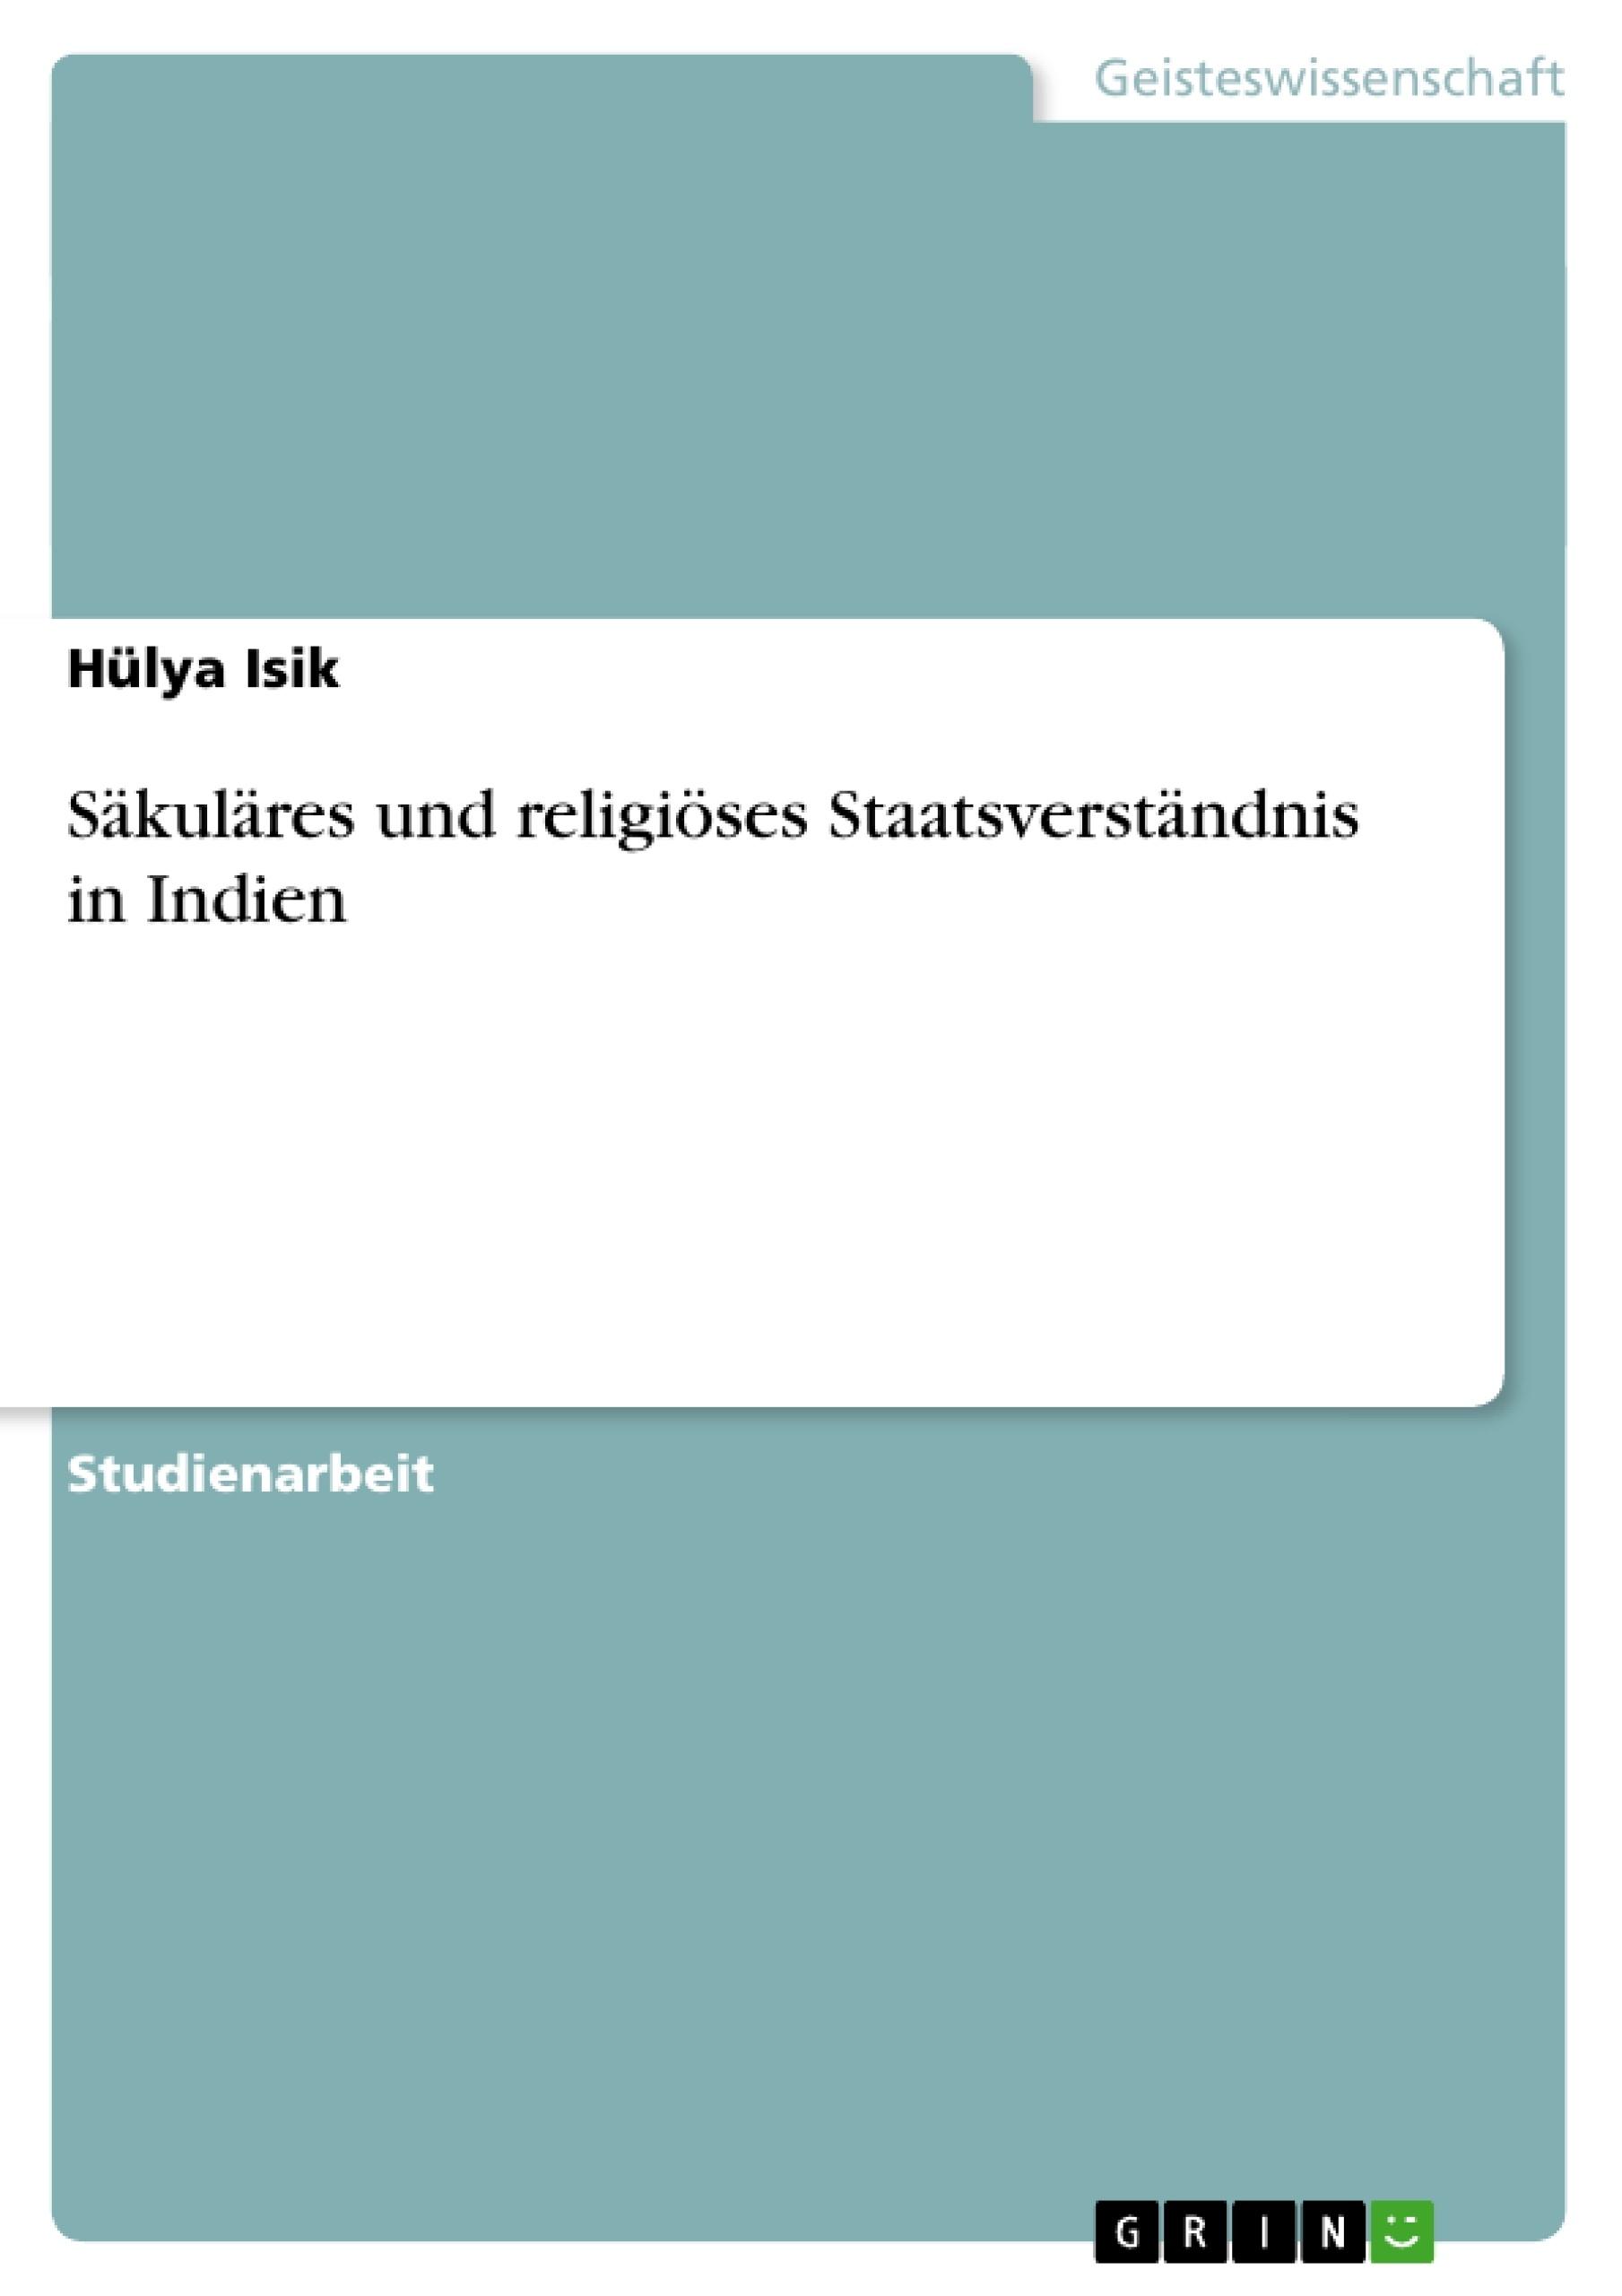 Titel: Säkuläres und religiöses Staatsverständnis in Indien